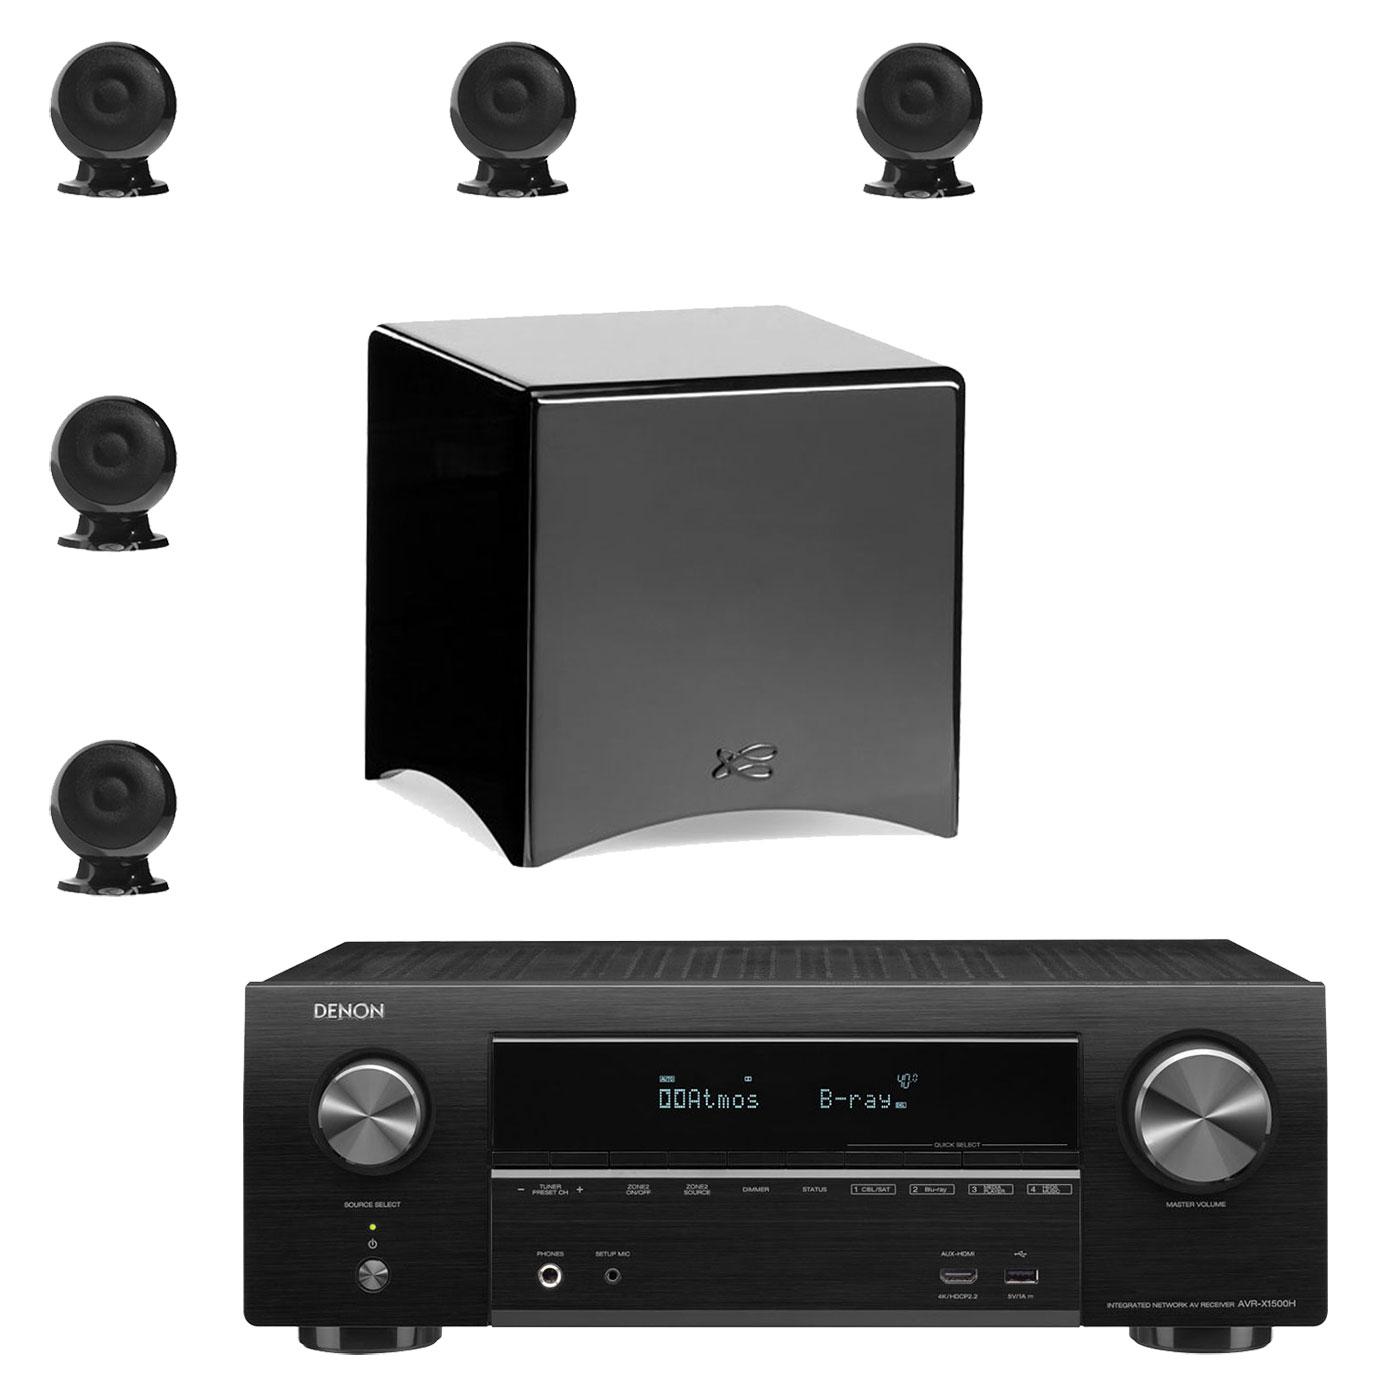 Ensemble home cinéma Denon AVR-X1500H Noir + Cabasse pack Eole 3 5.1 WS Noir Ampli-tuner Home Cinema 3D Ready 7.2 - Dolby Atmos / DTS:X - 6x HDMI 4K Ultra HD, HDCP 2.2, HDR - Wi-Fi, Bluetooth, AirPlay 2 - Multiroom - Amazon Alexa + Ensemble 5.1